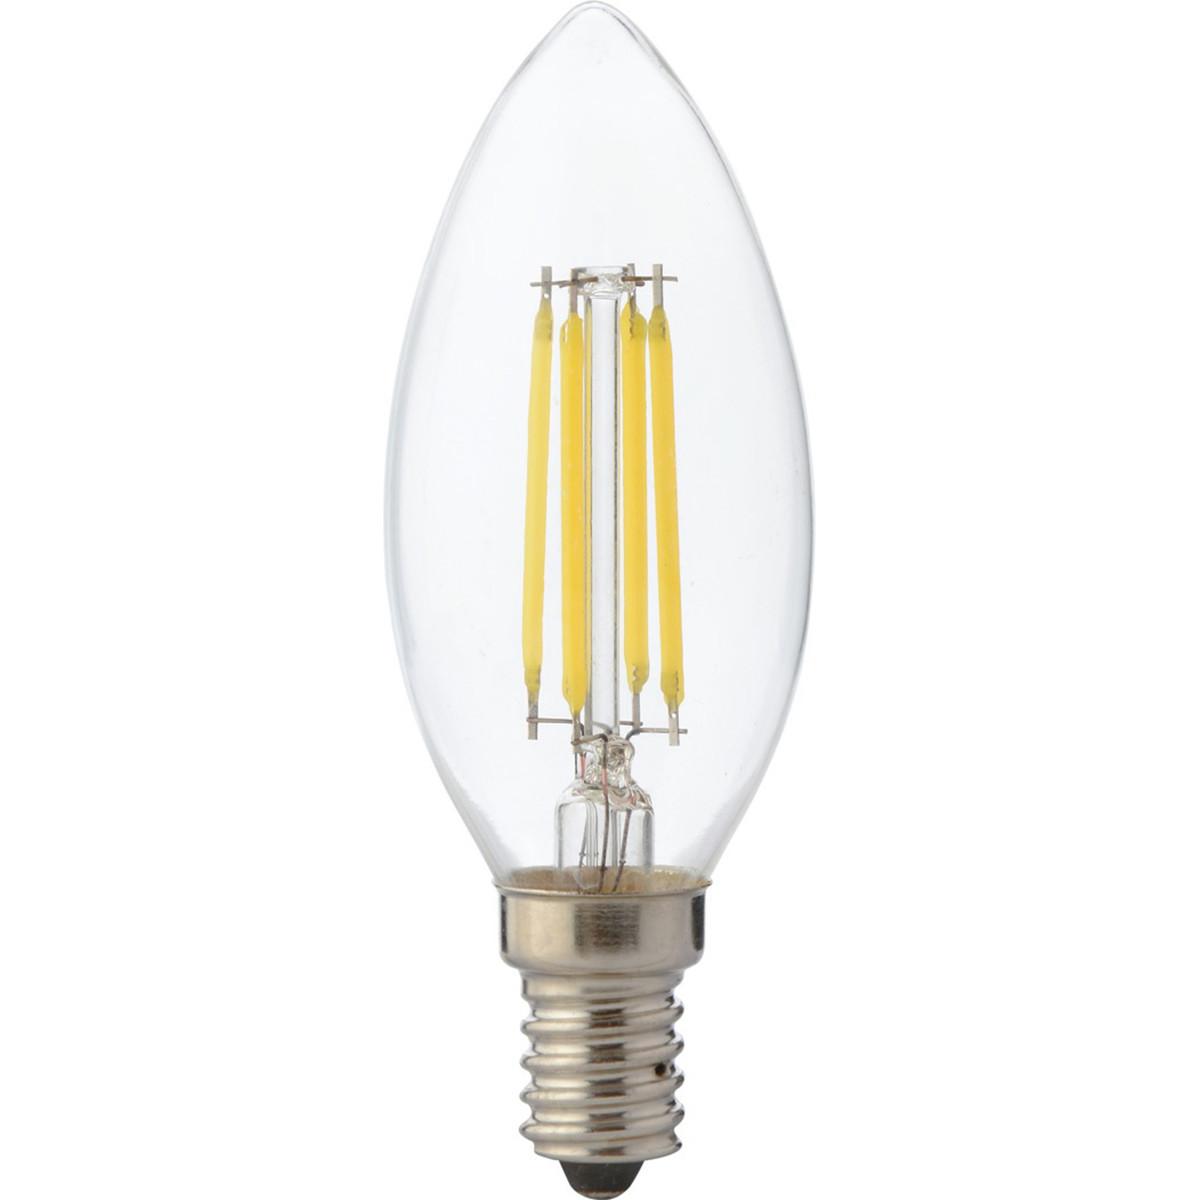 LED Lamp - Kaarslamp - Filament - E14 Fitting - 4W Dimbaar - Warm Wit 2700K